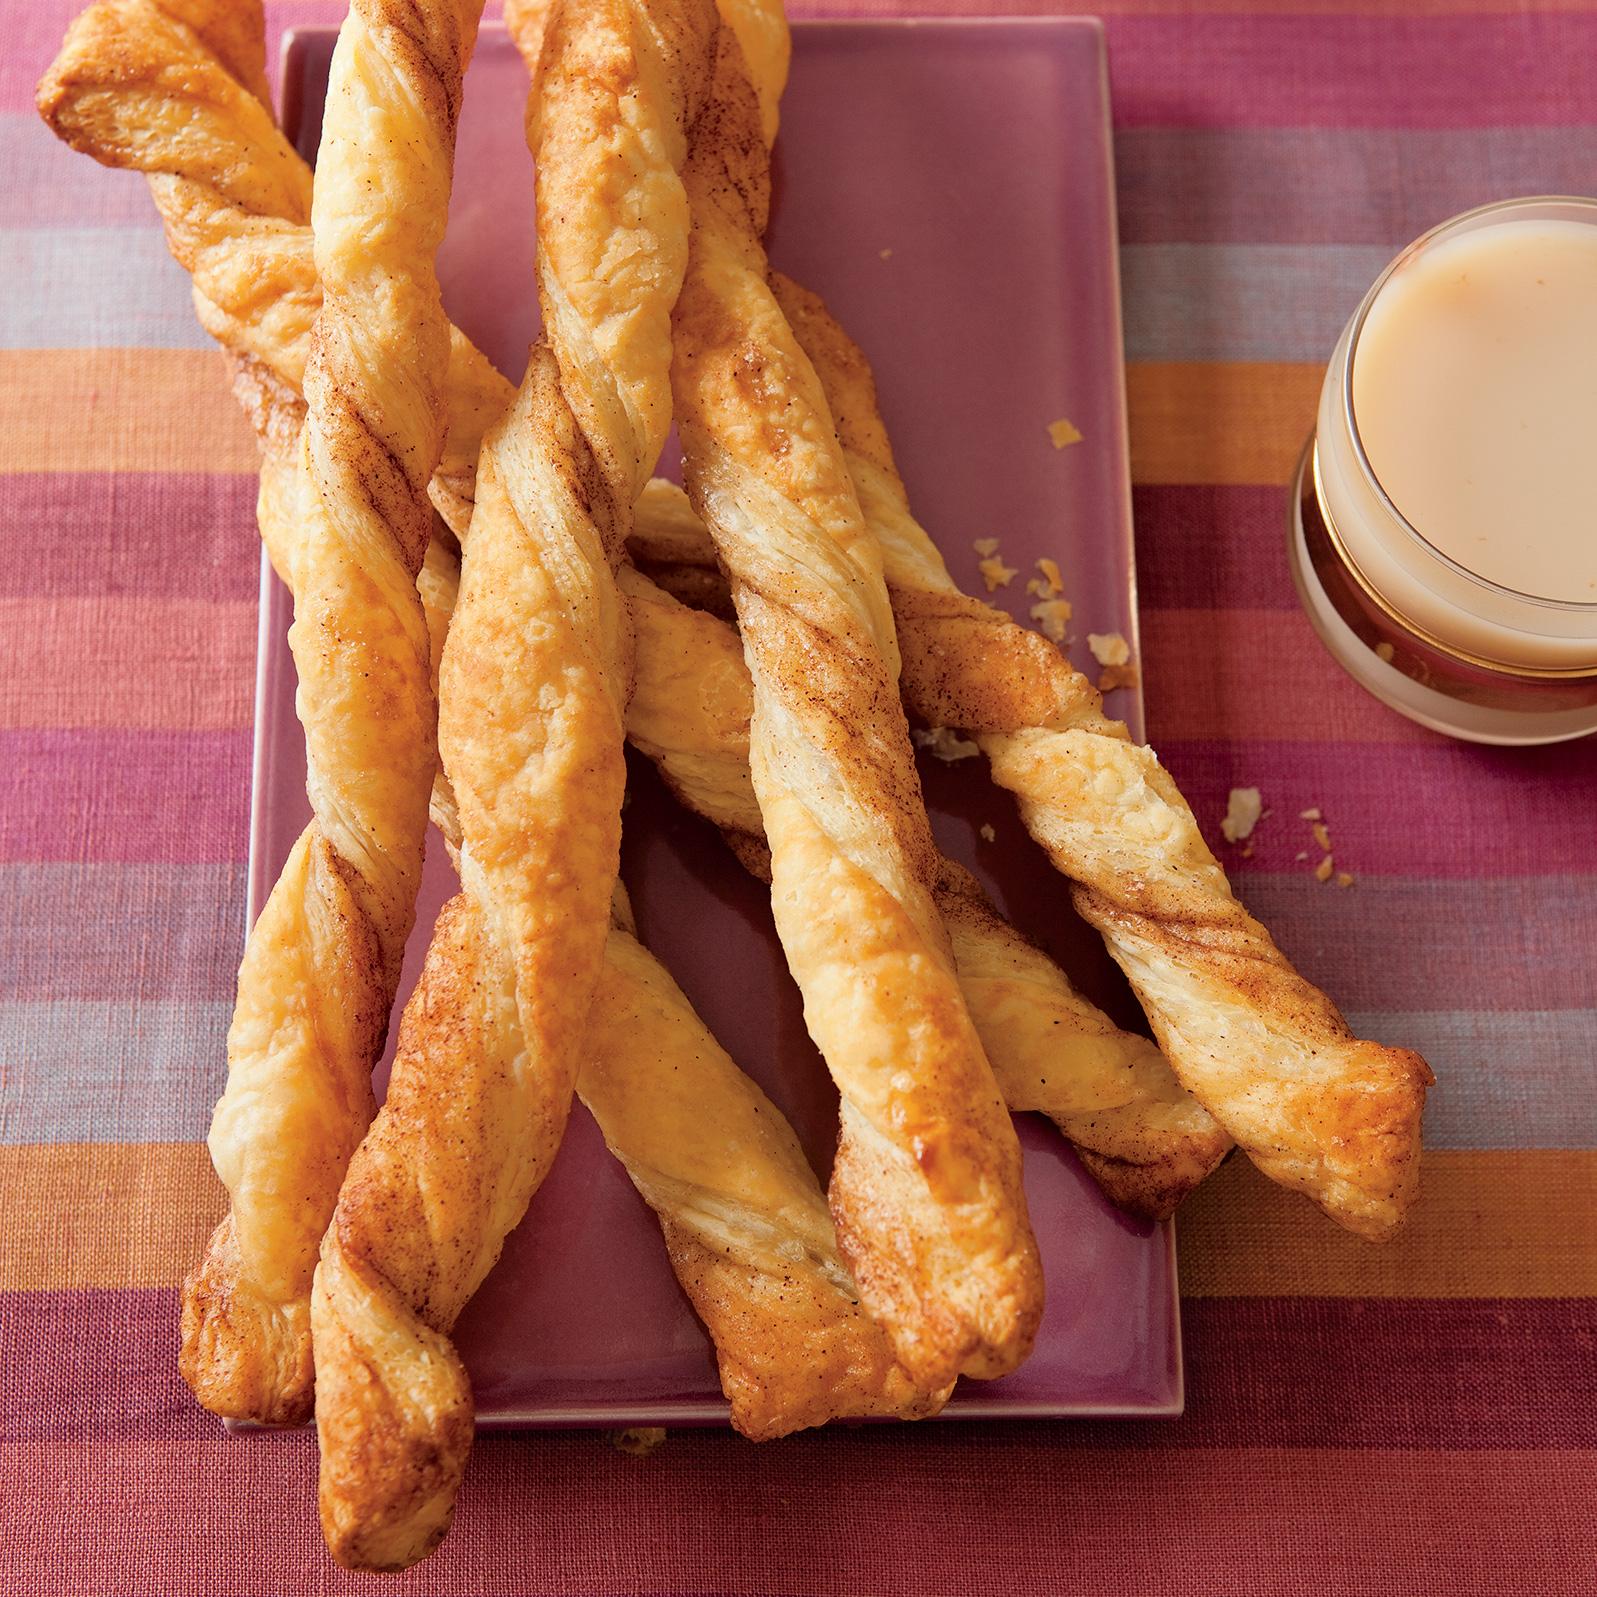 Cinnamon-Sugar Twists